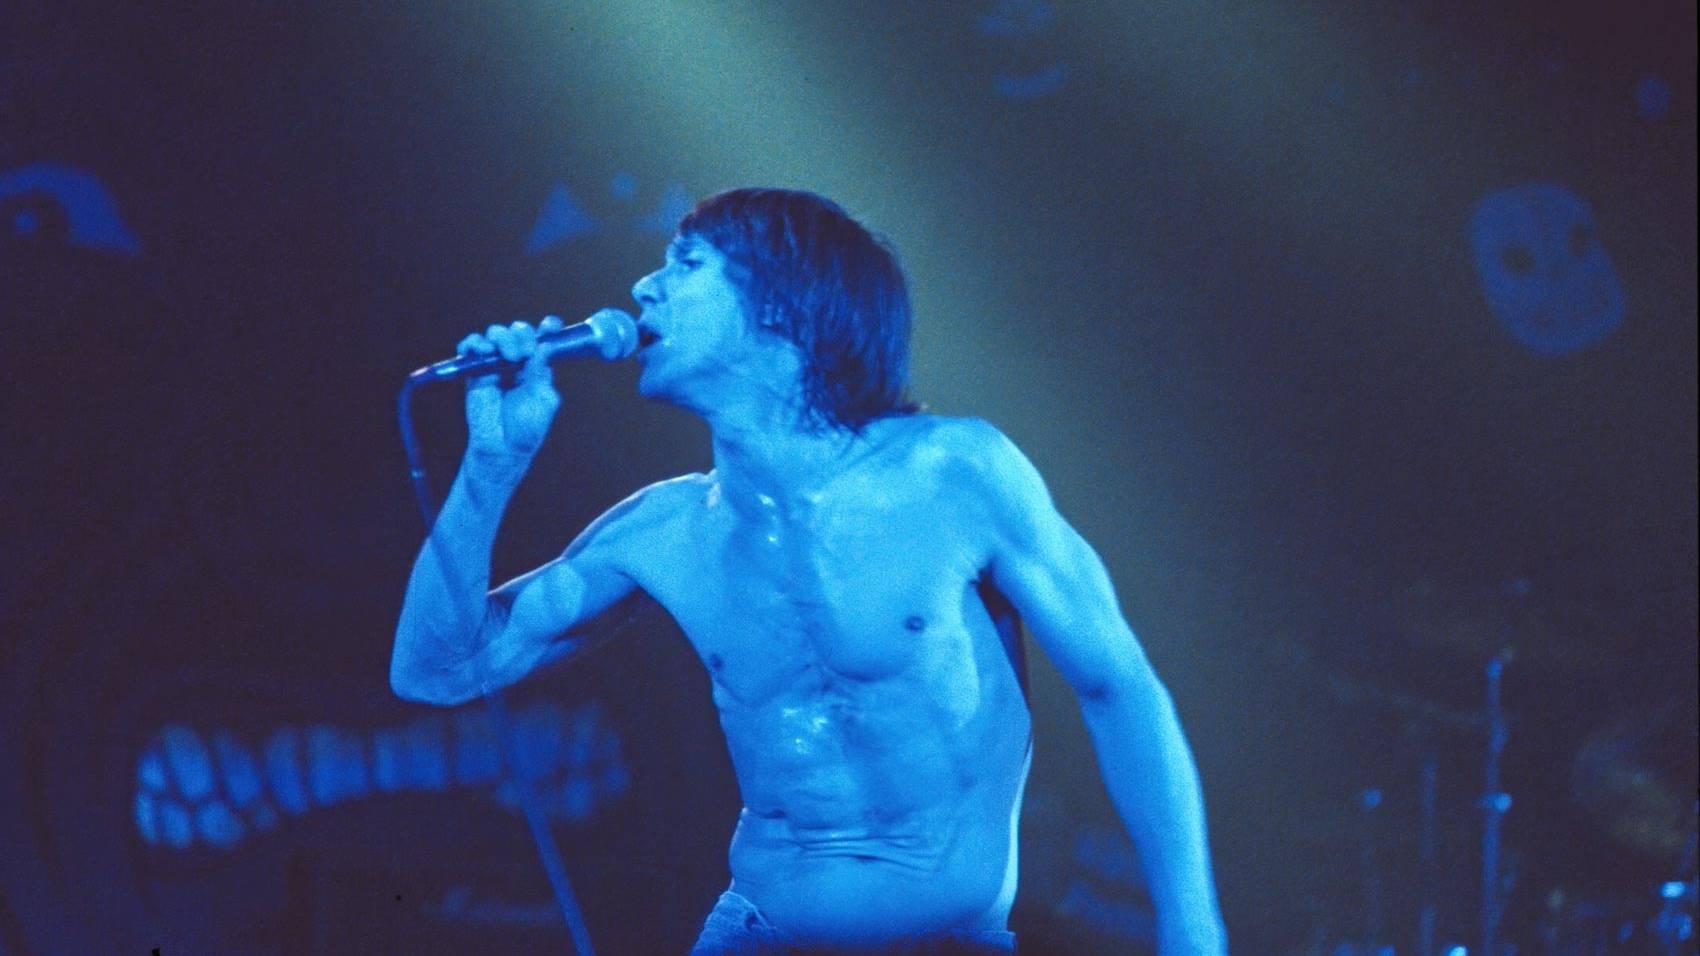 Joyside Iggy Pop Rolling Stone Milano 1989